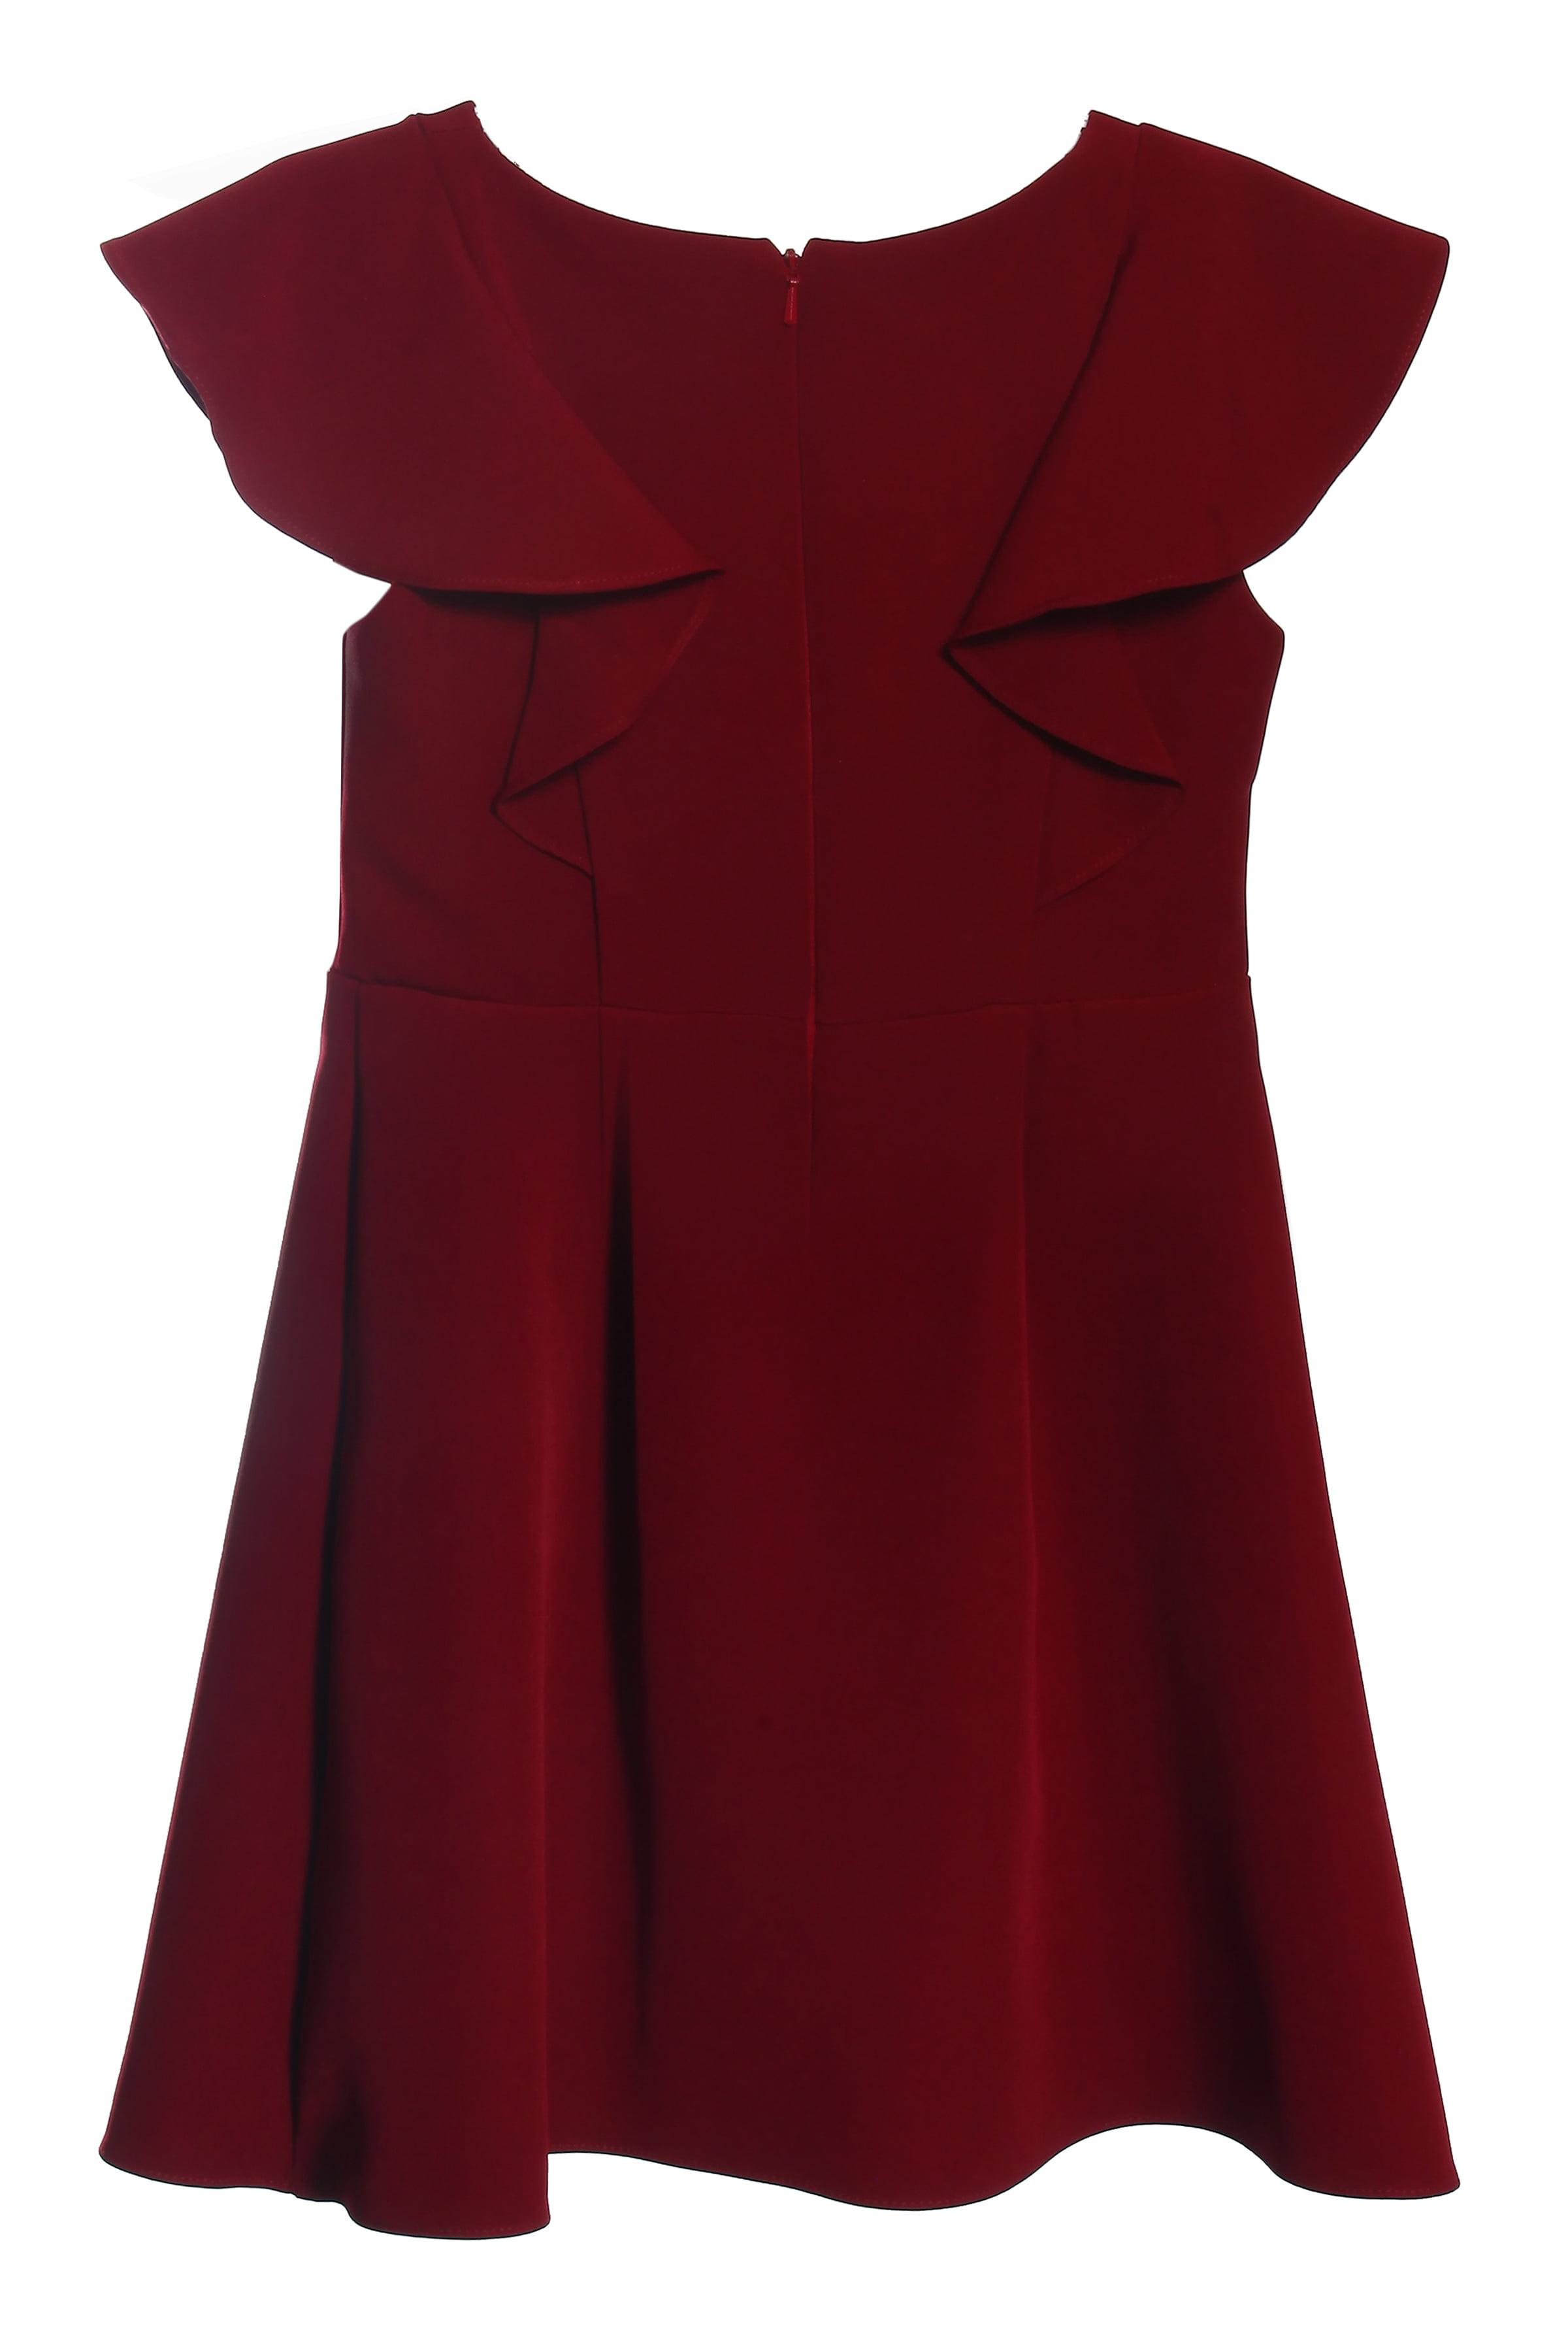 7903955cb6a Maroon Flower Girl Dresses - Gomes Weine AG